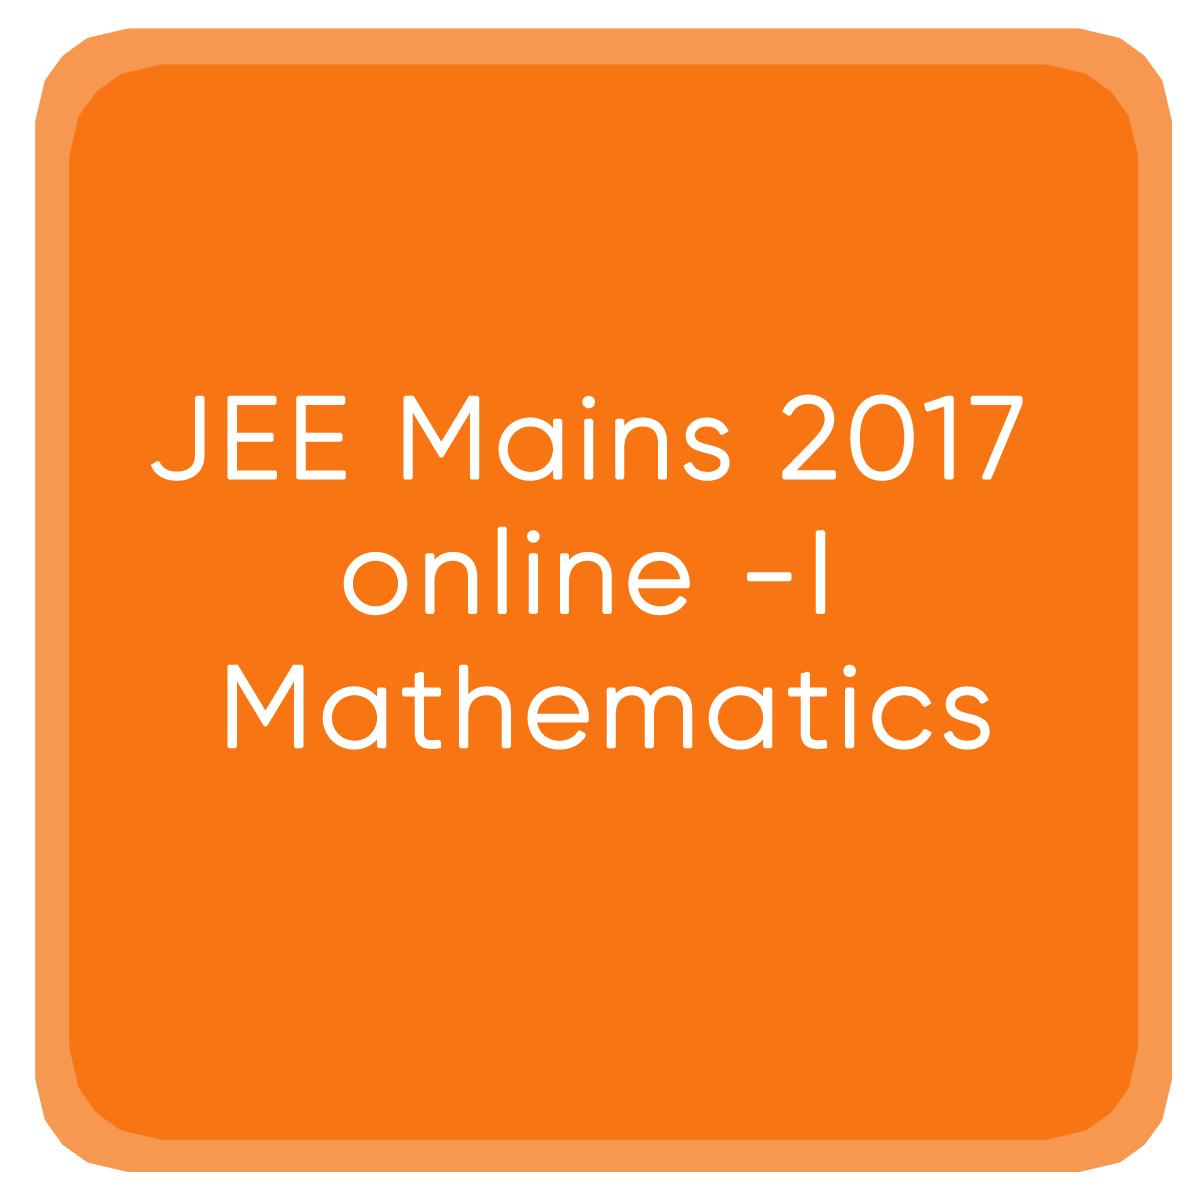 JEE Mains 2017 online -I Mathematics